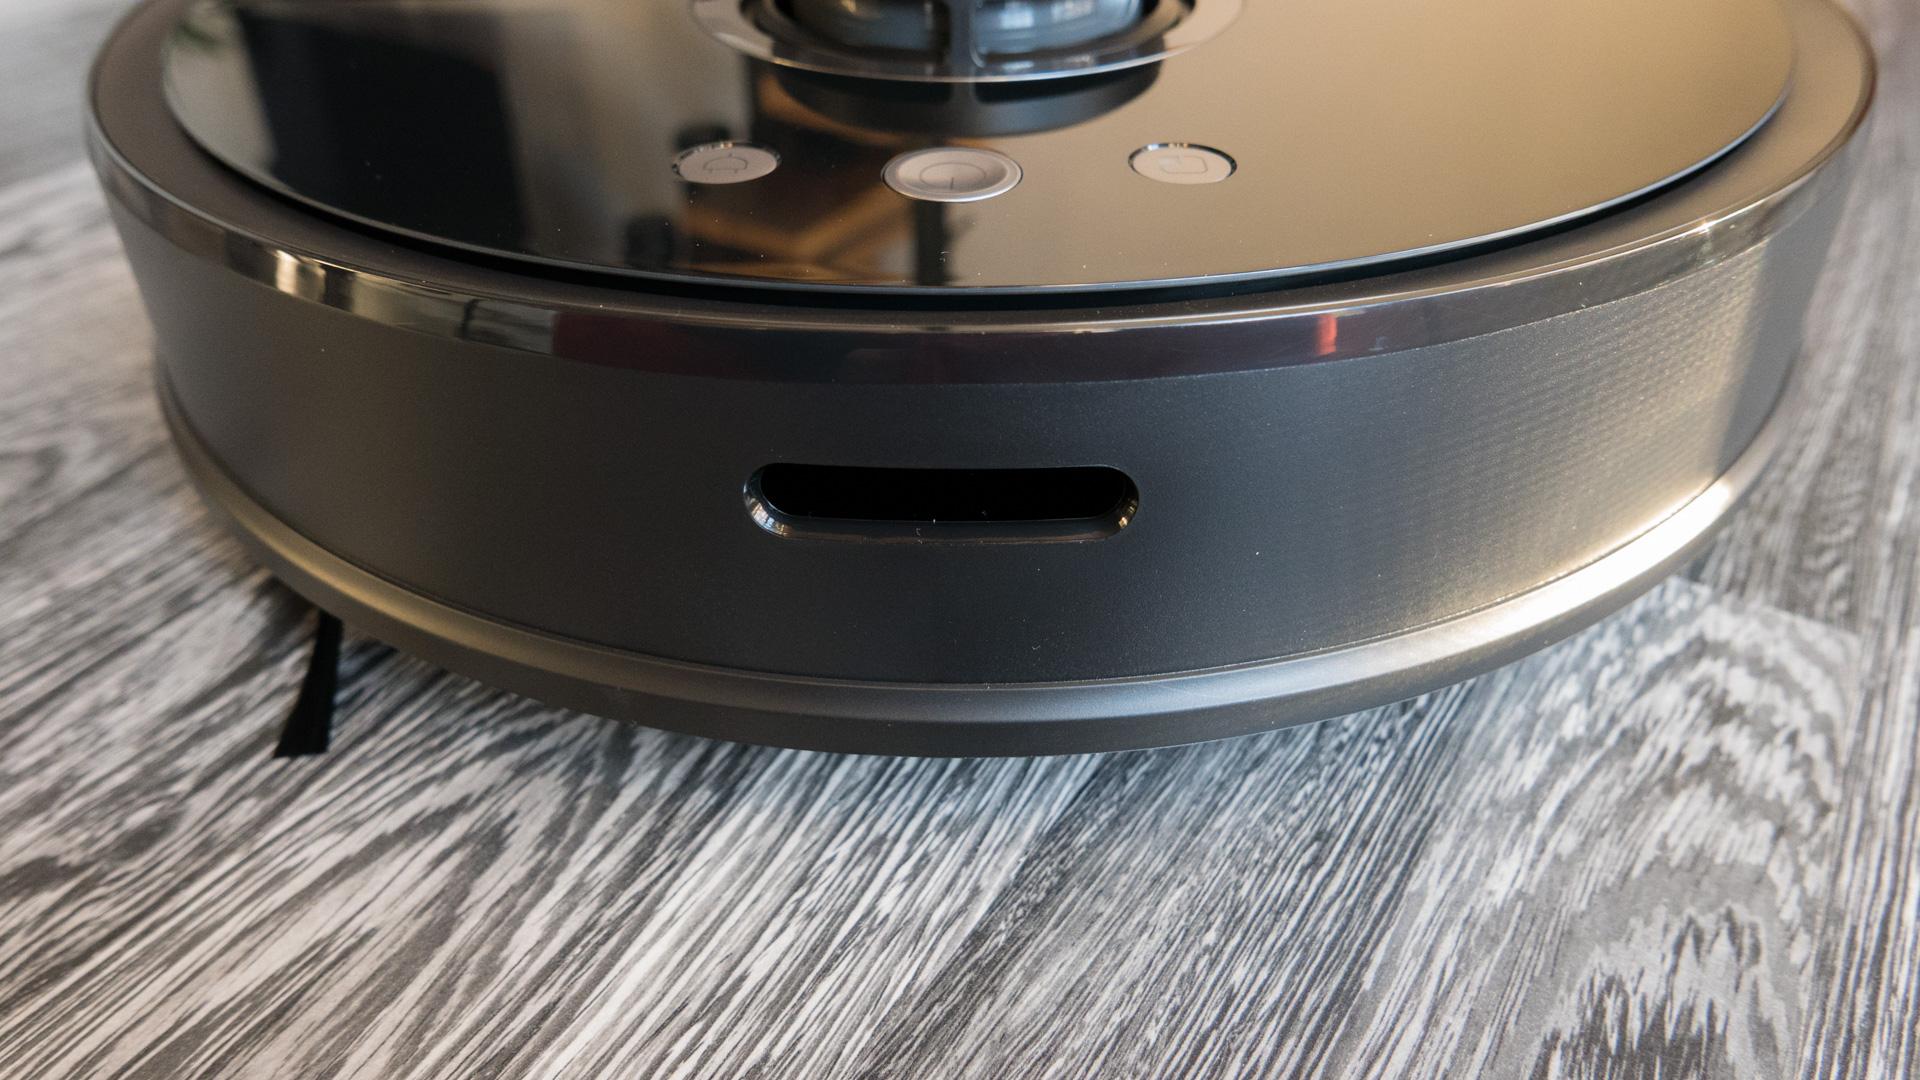 Xiaomi-roborock-S55-Details-9